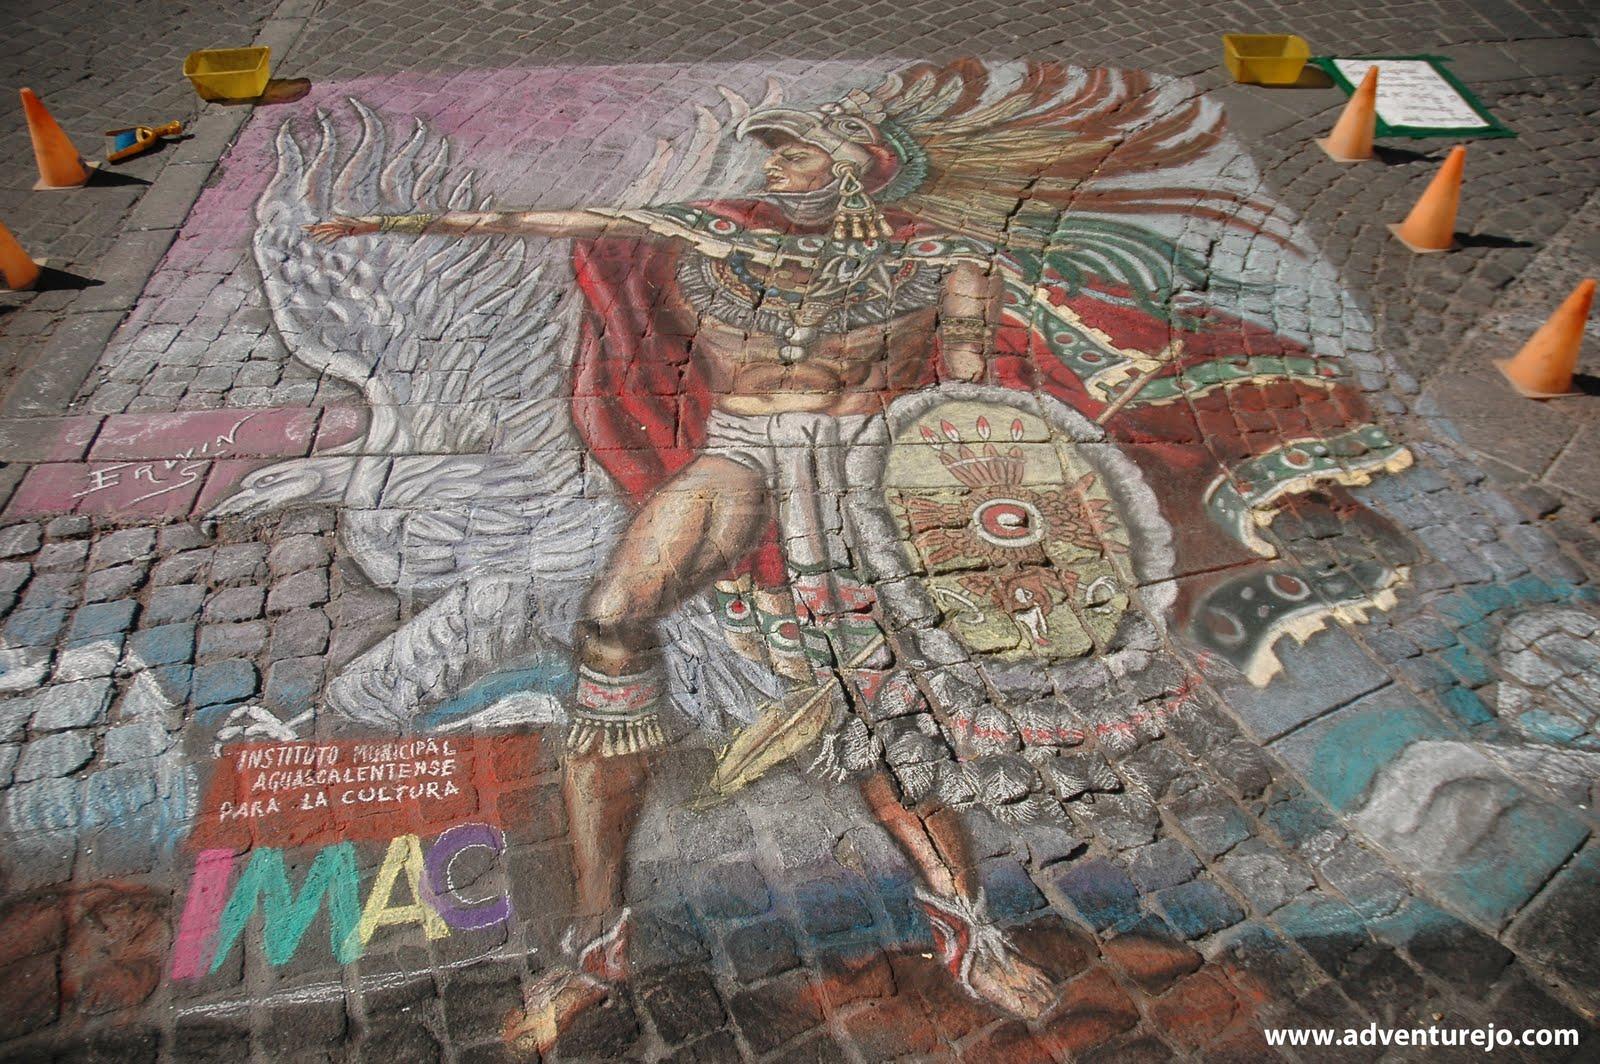 Photos from the San Marcos National Fair in Aguascalientes Mexico